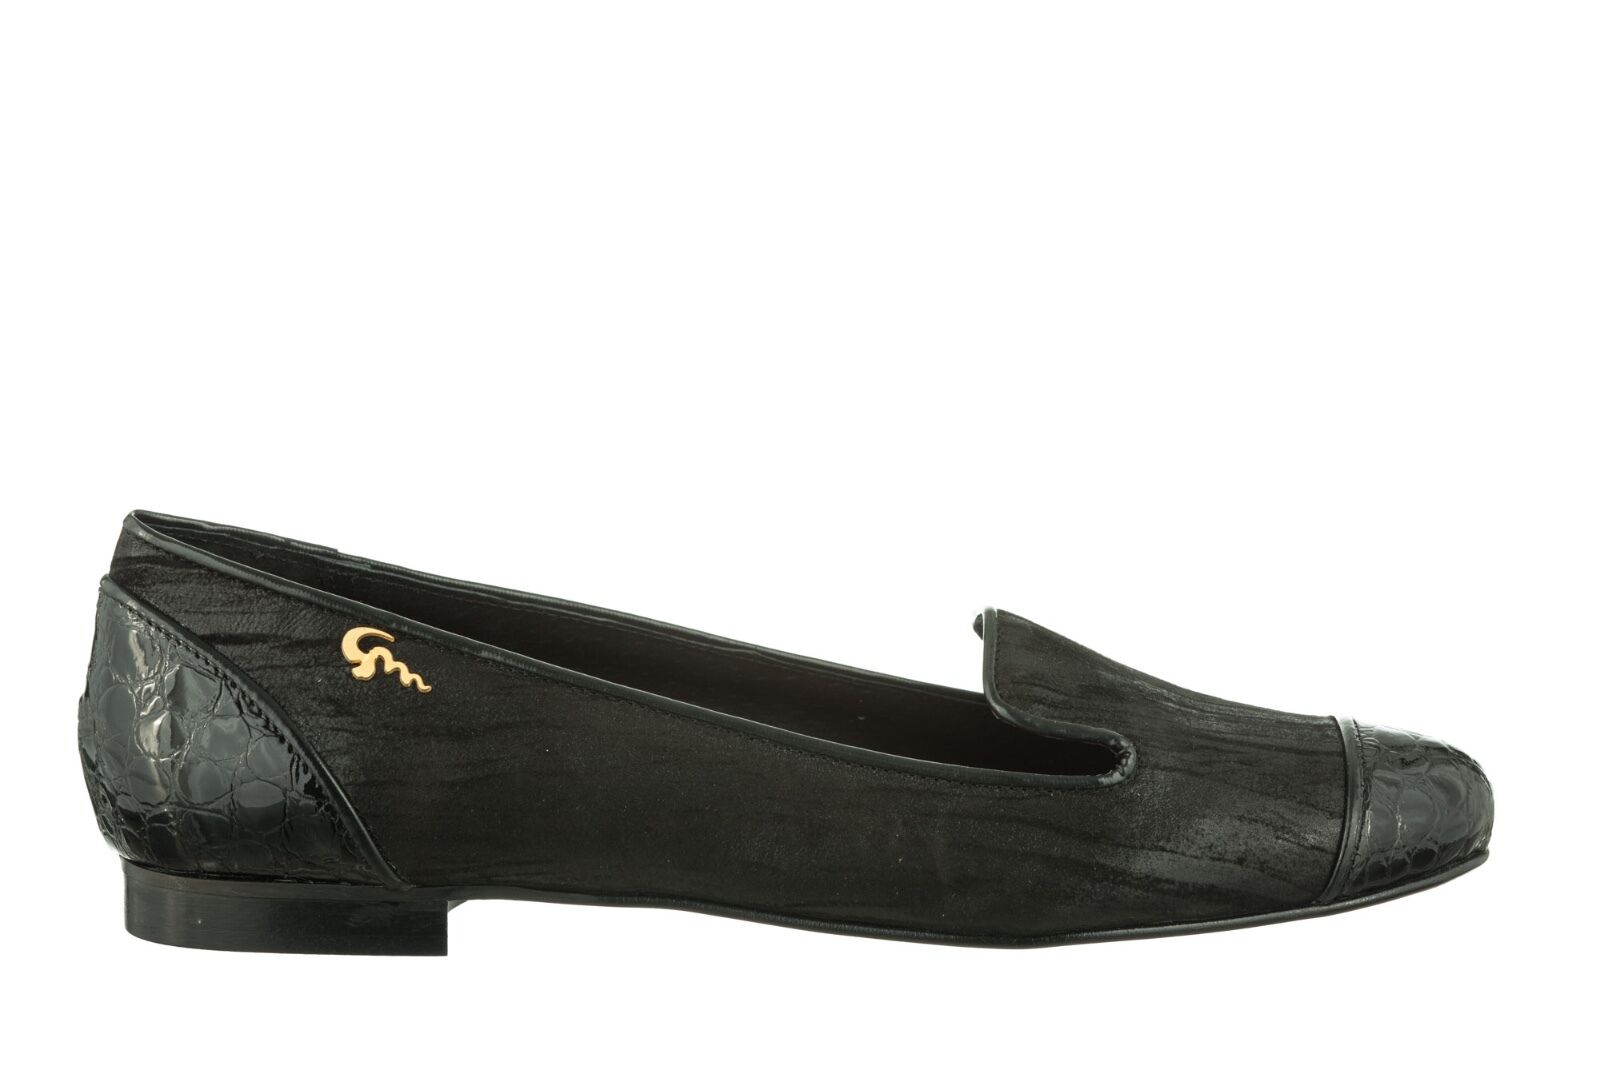 MORI MADE IN ITALY SLIP ON FLATS SCHUHE Schuhe BALLERINA BALLERINA Schuhe LEATHER NERO BLACK 42 8fea27